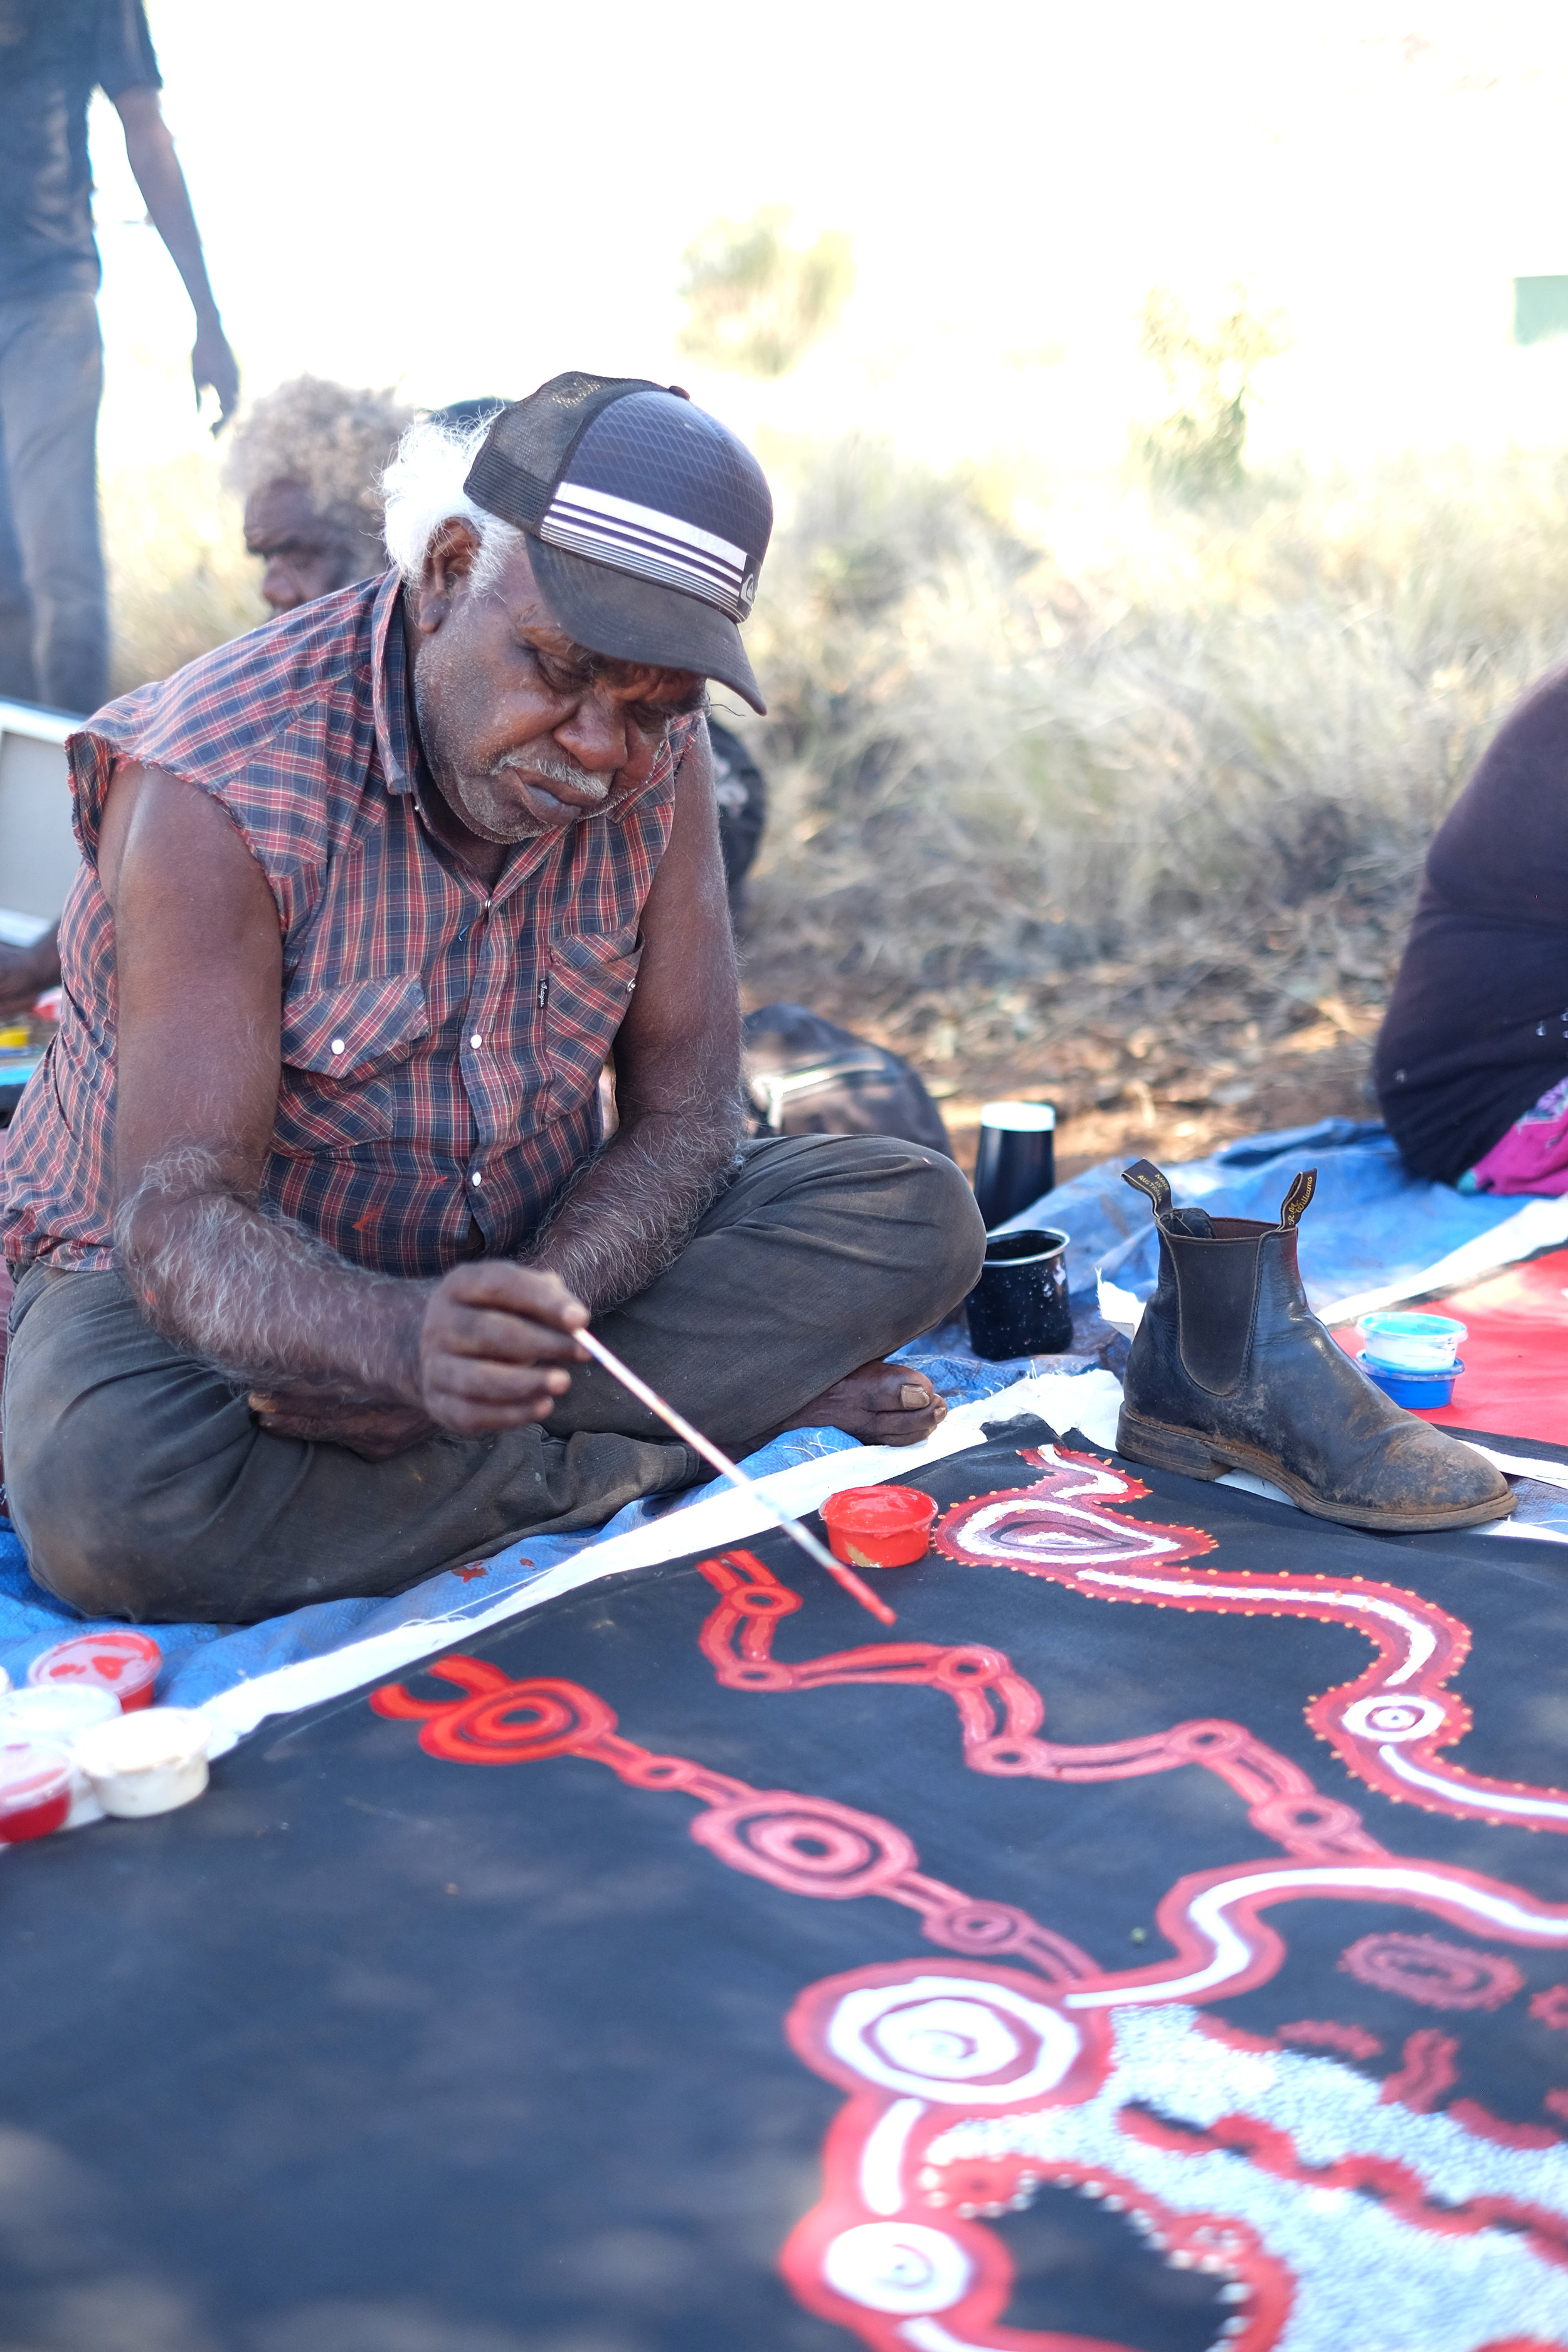 Mr David Miller painting outside of Kalka community, APY Lands, 2018. Photo by Melanie Henderson, Ku Arts.